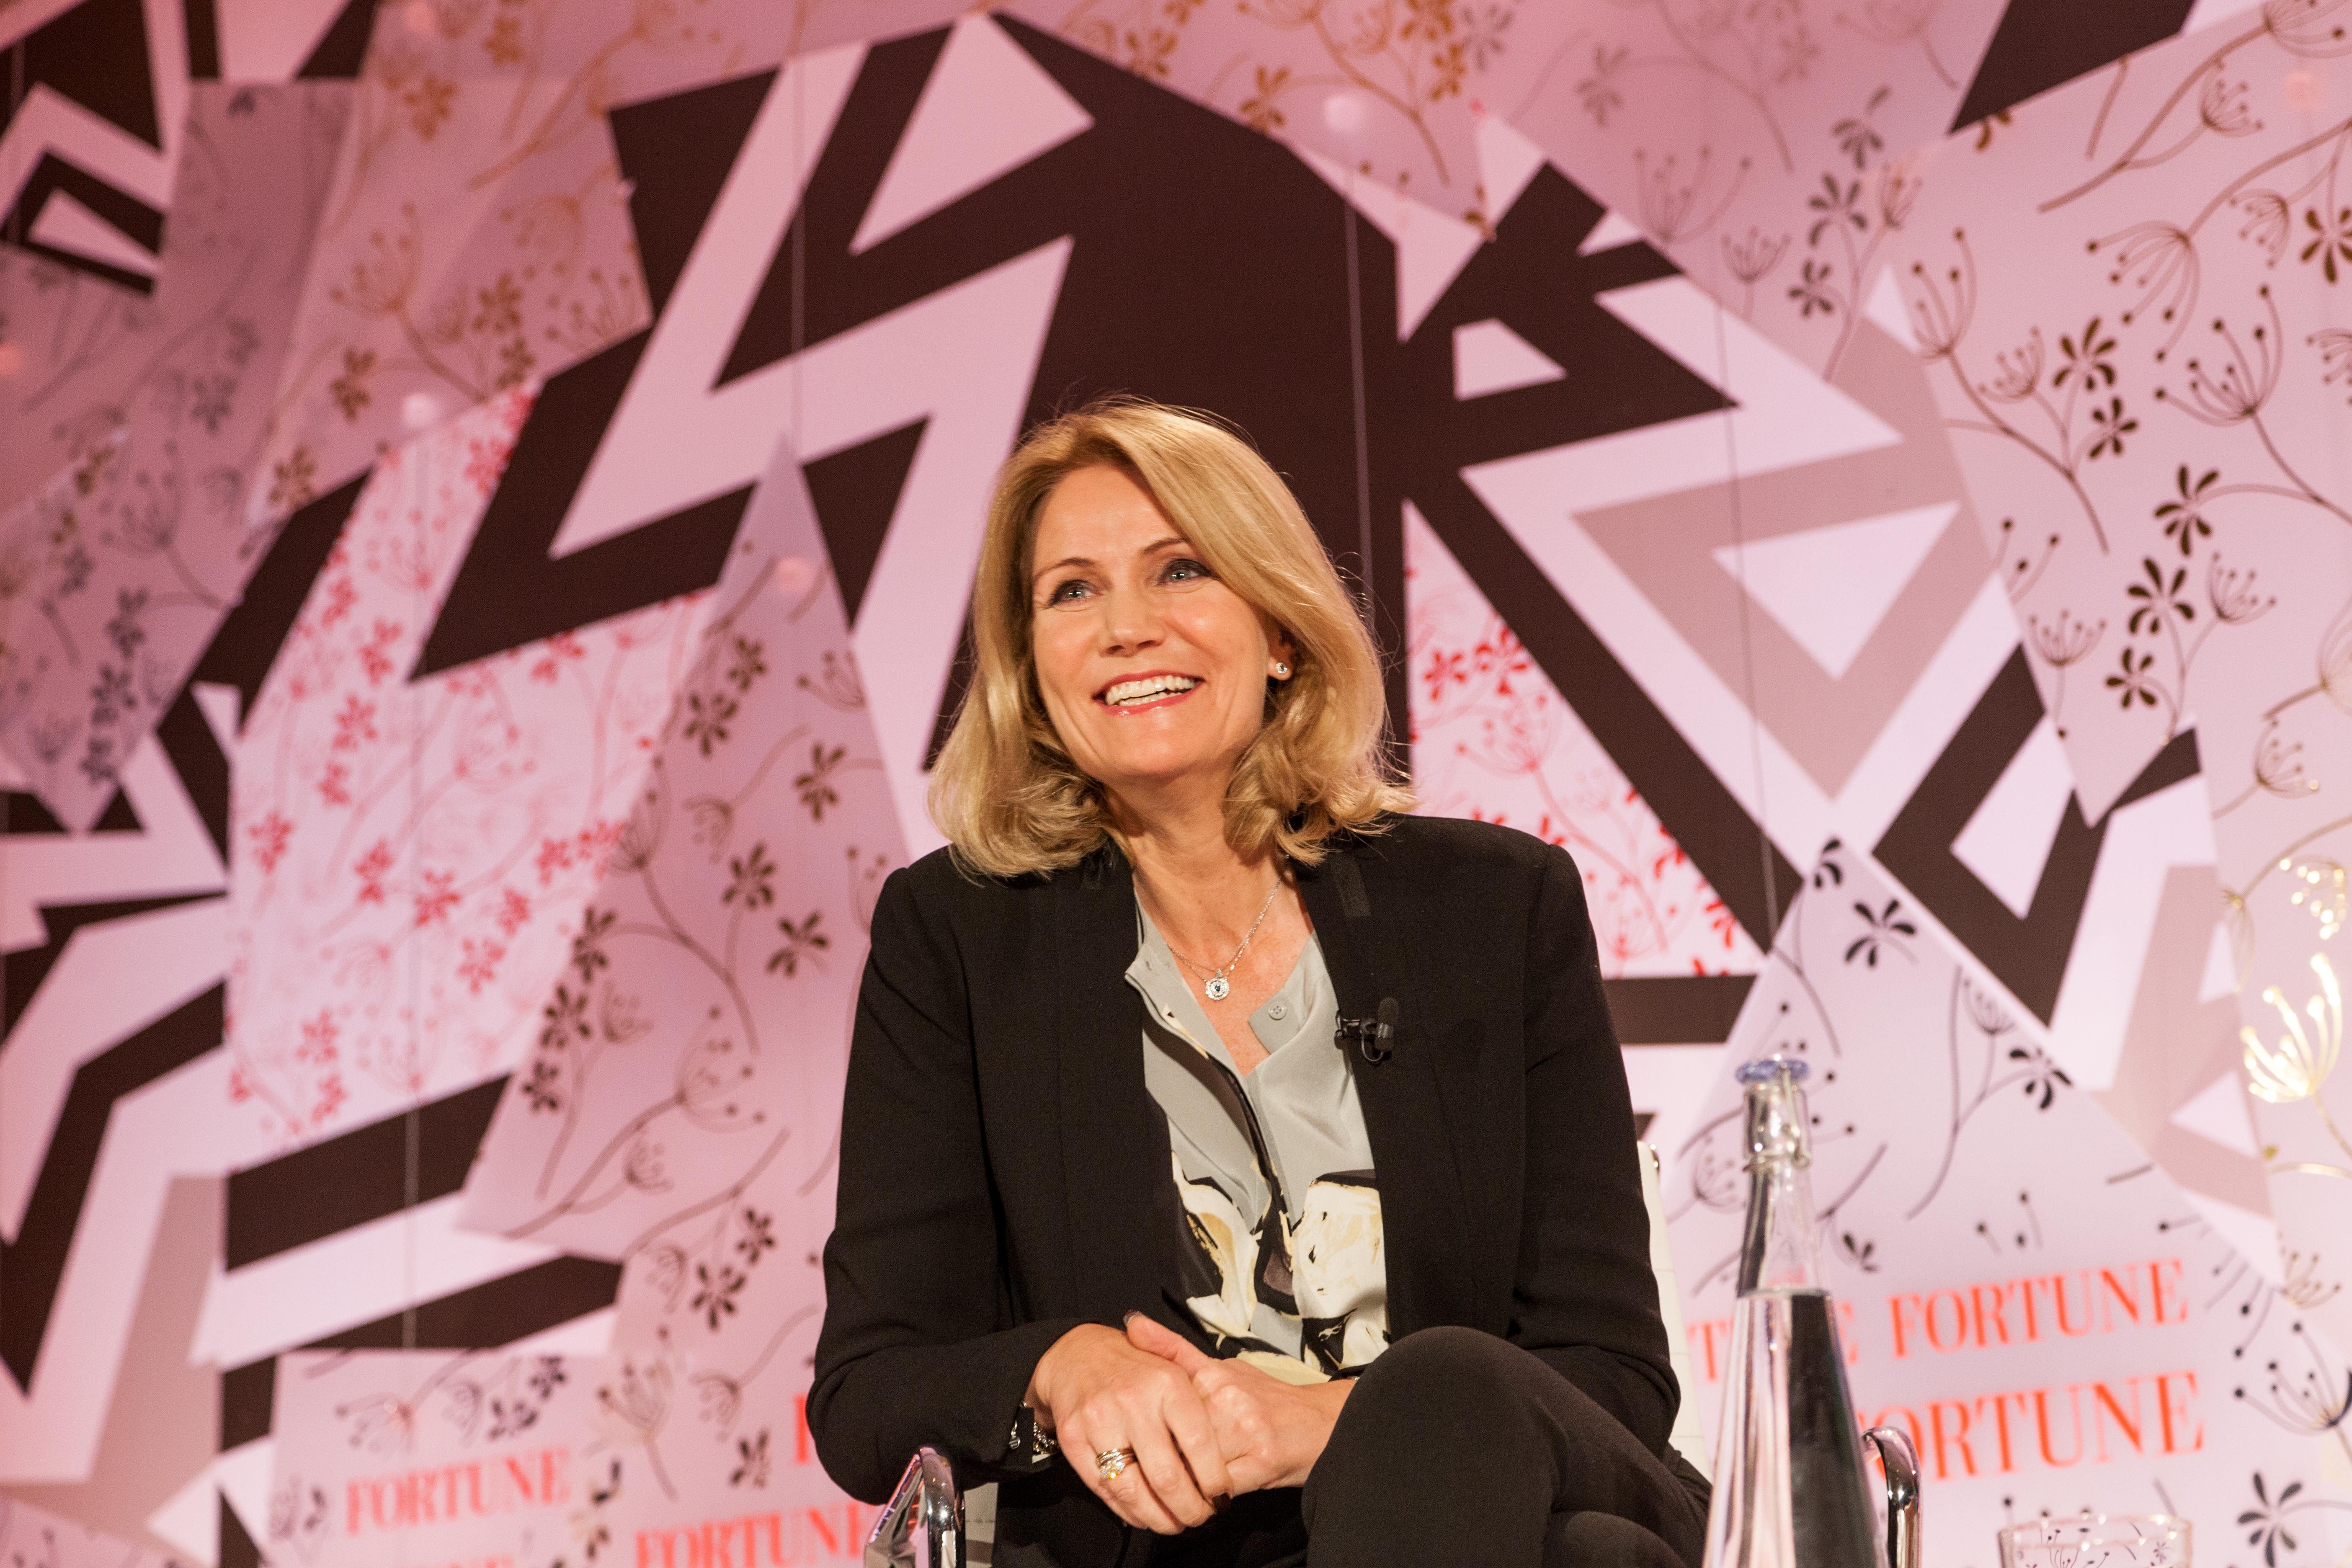 Denmark's former Prime Minister Helle Thorning-Schmidt addresses Fortune' Most Powerful Women Summit in London.